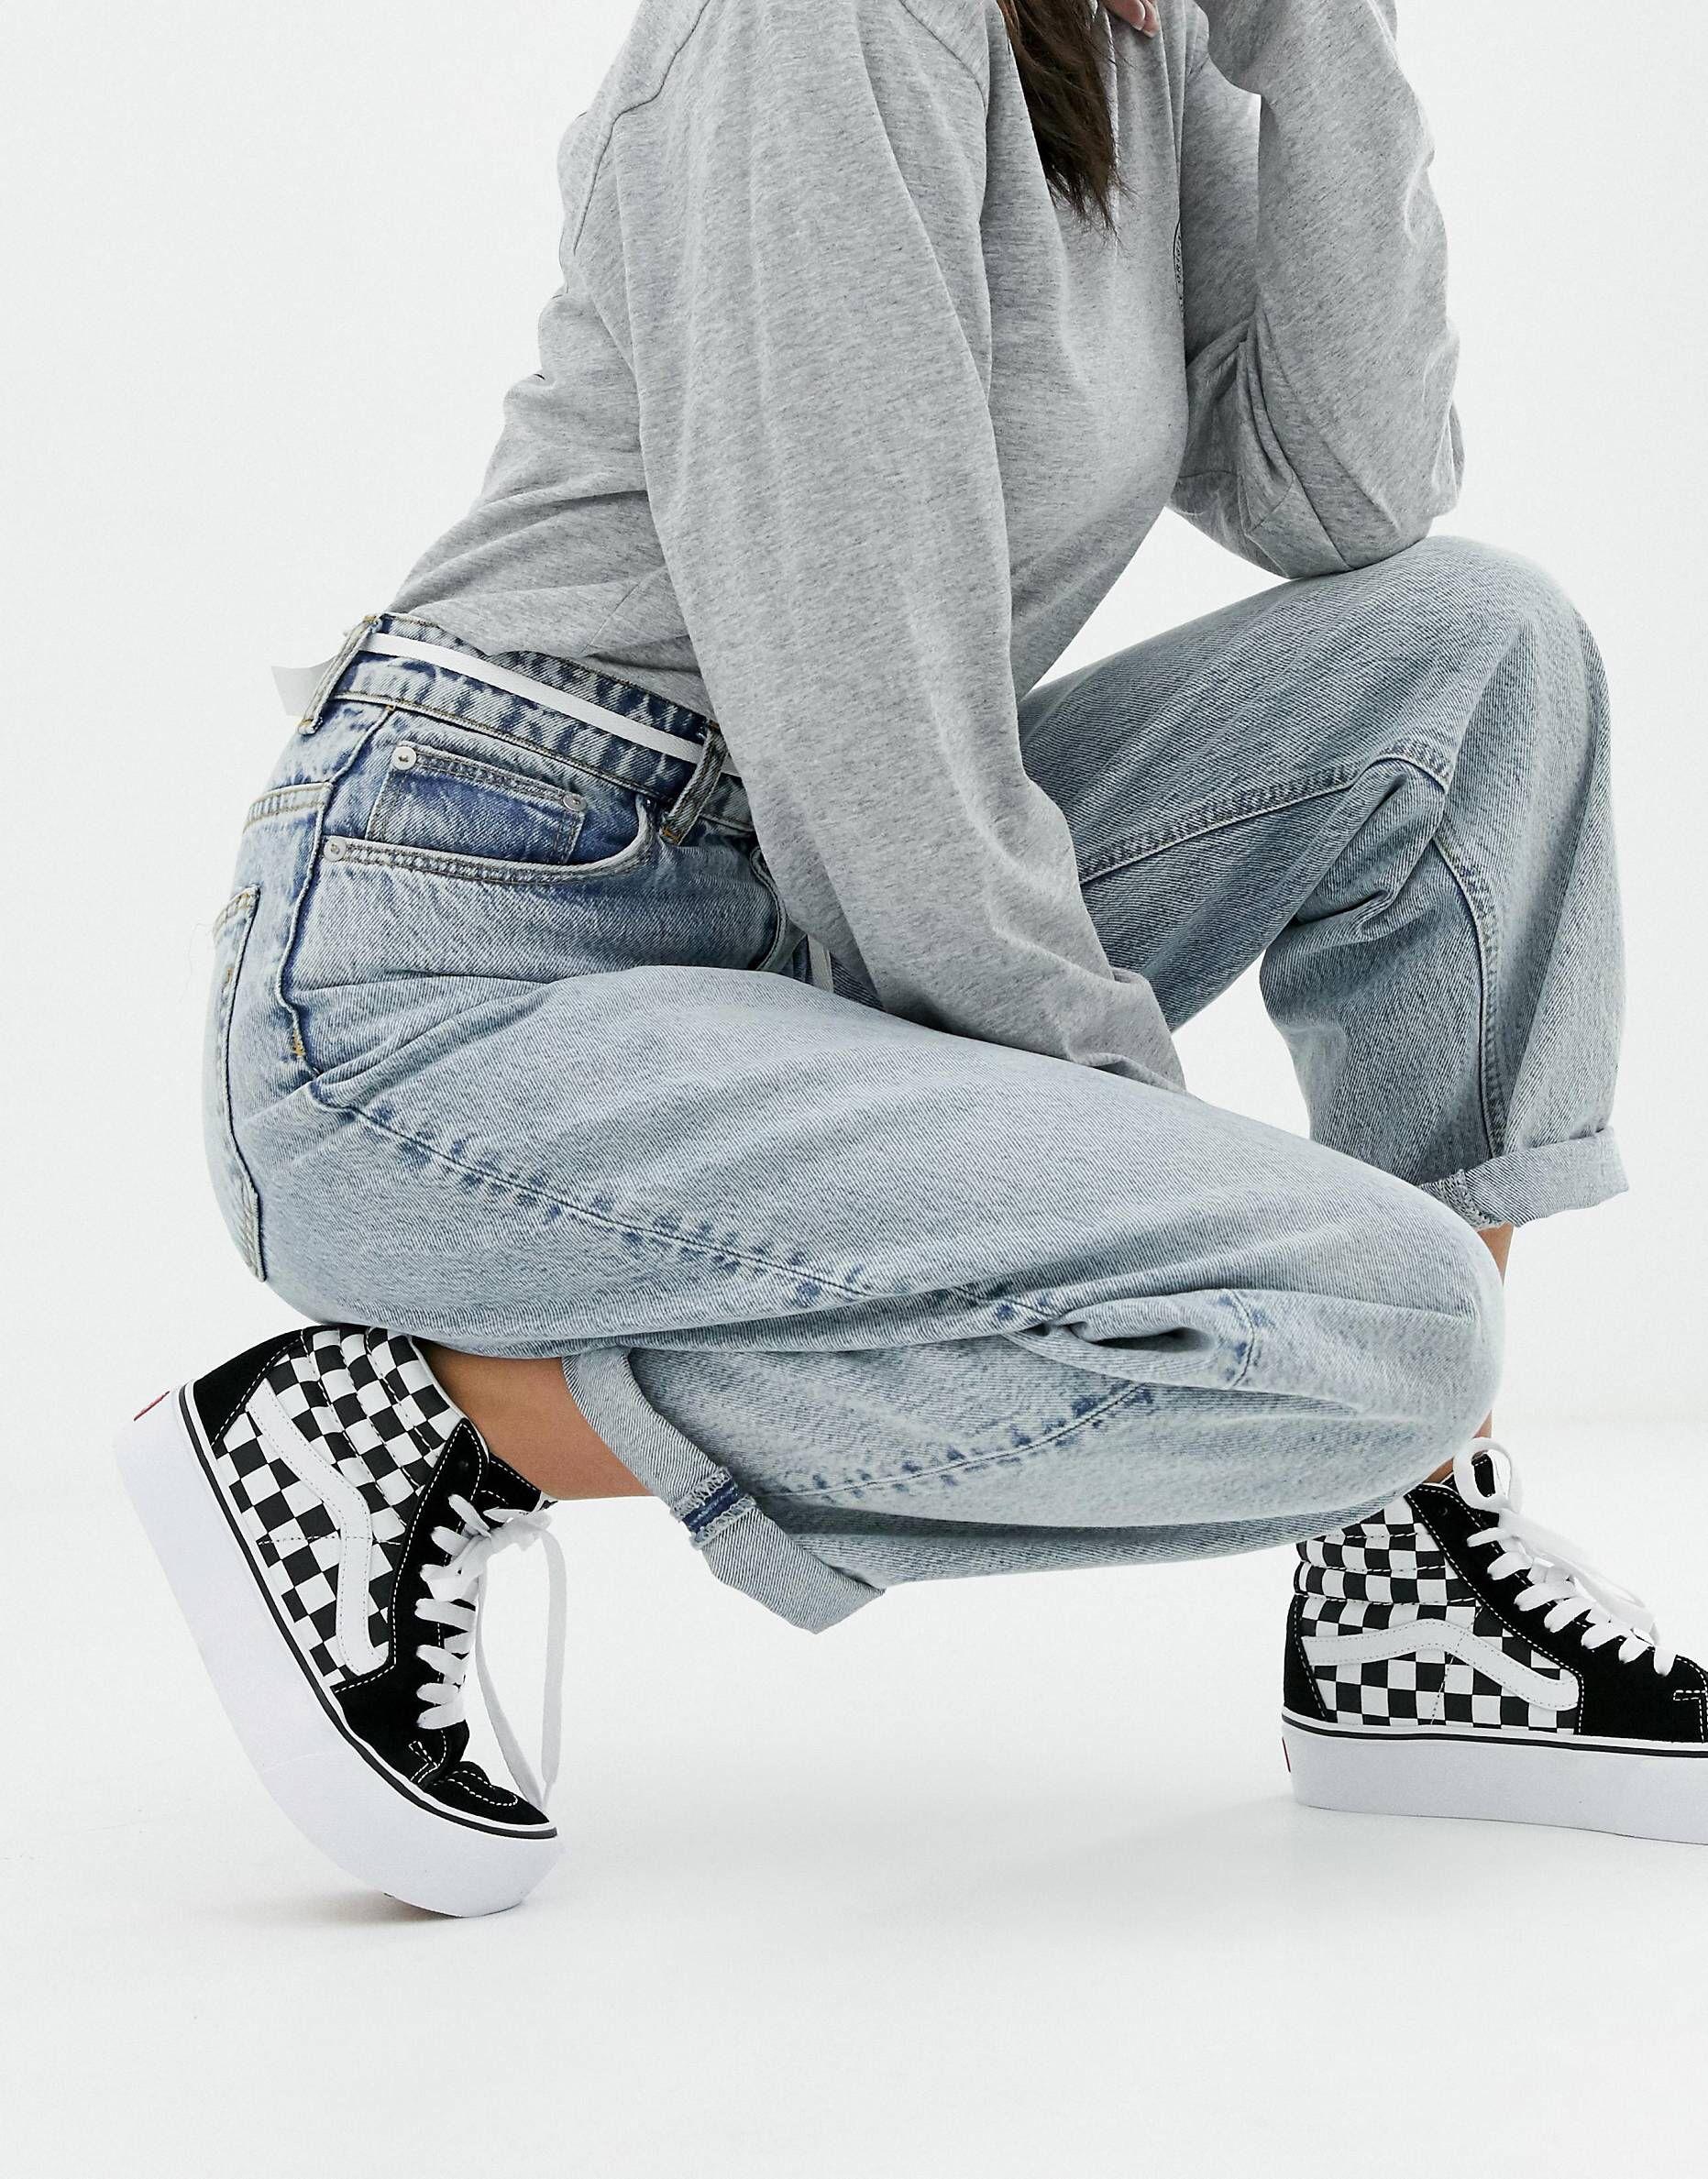 be3da45092 Vans Black Checkerboard Platform Sk8-Hi Sneakers in 2019